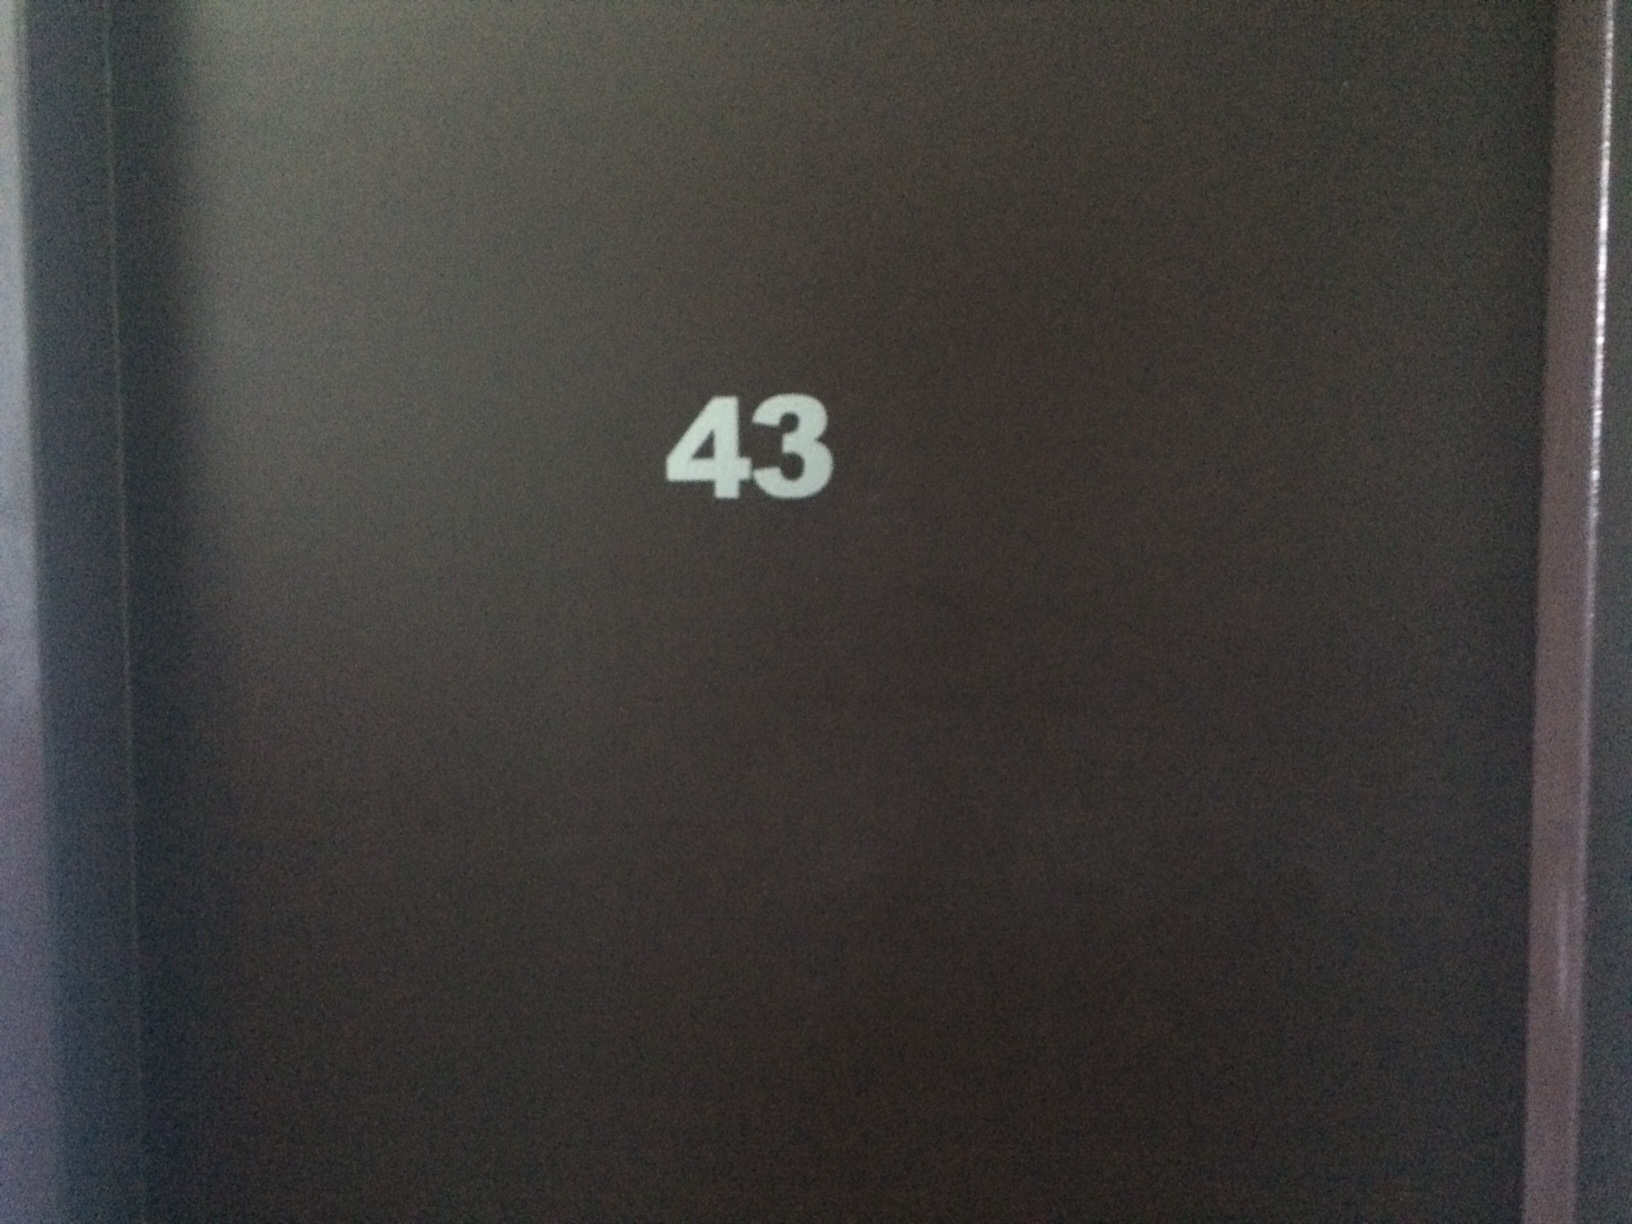 Boxa nr.43, Ansamblul Izvorul Dorului, Sinaia